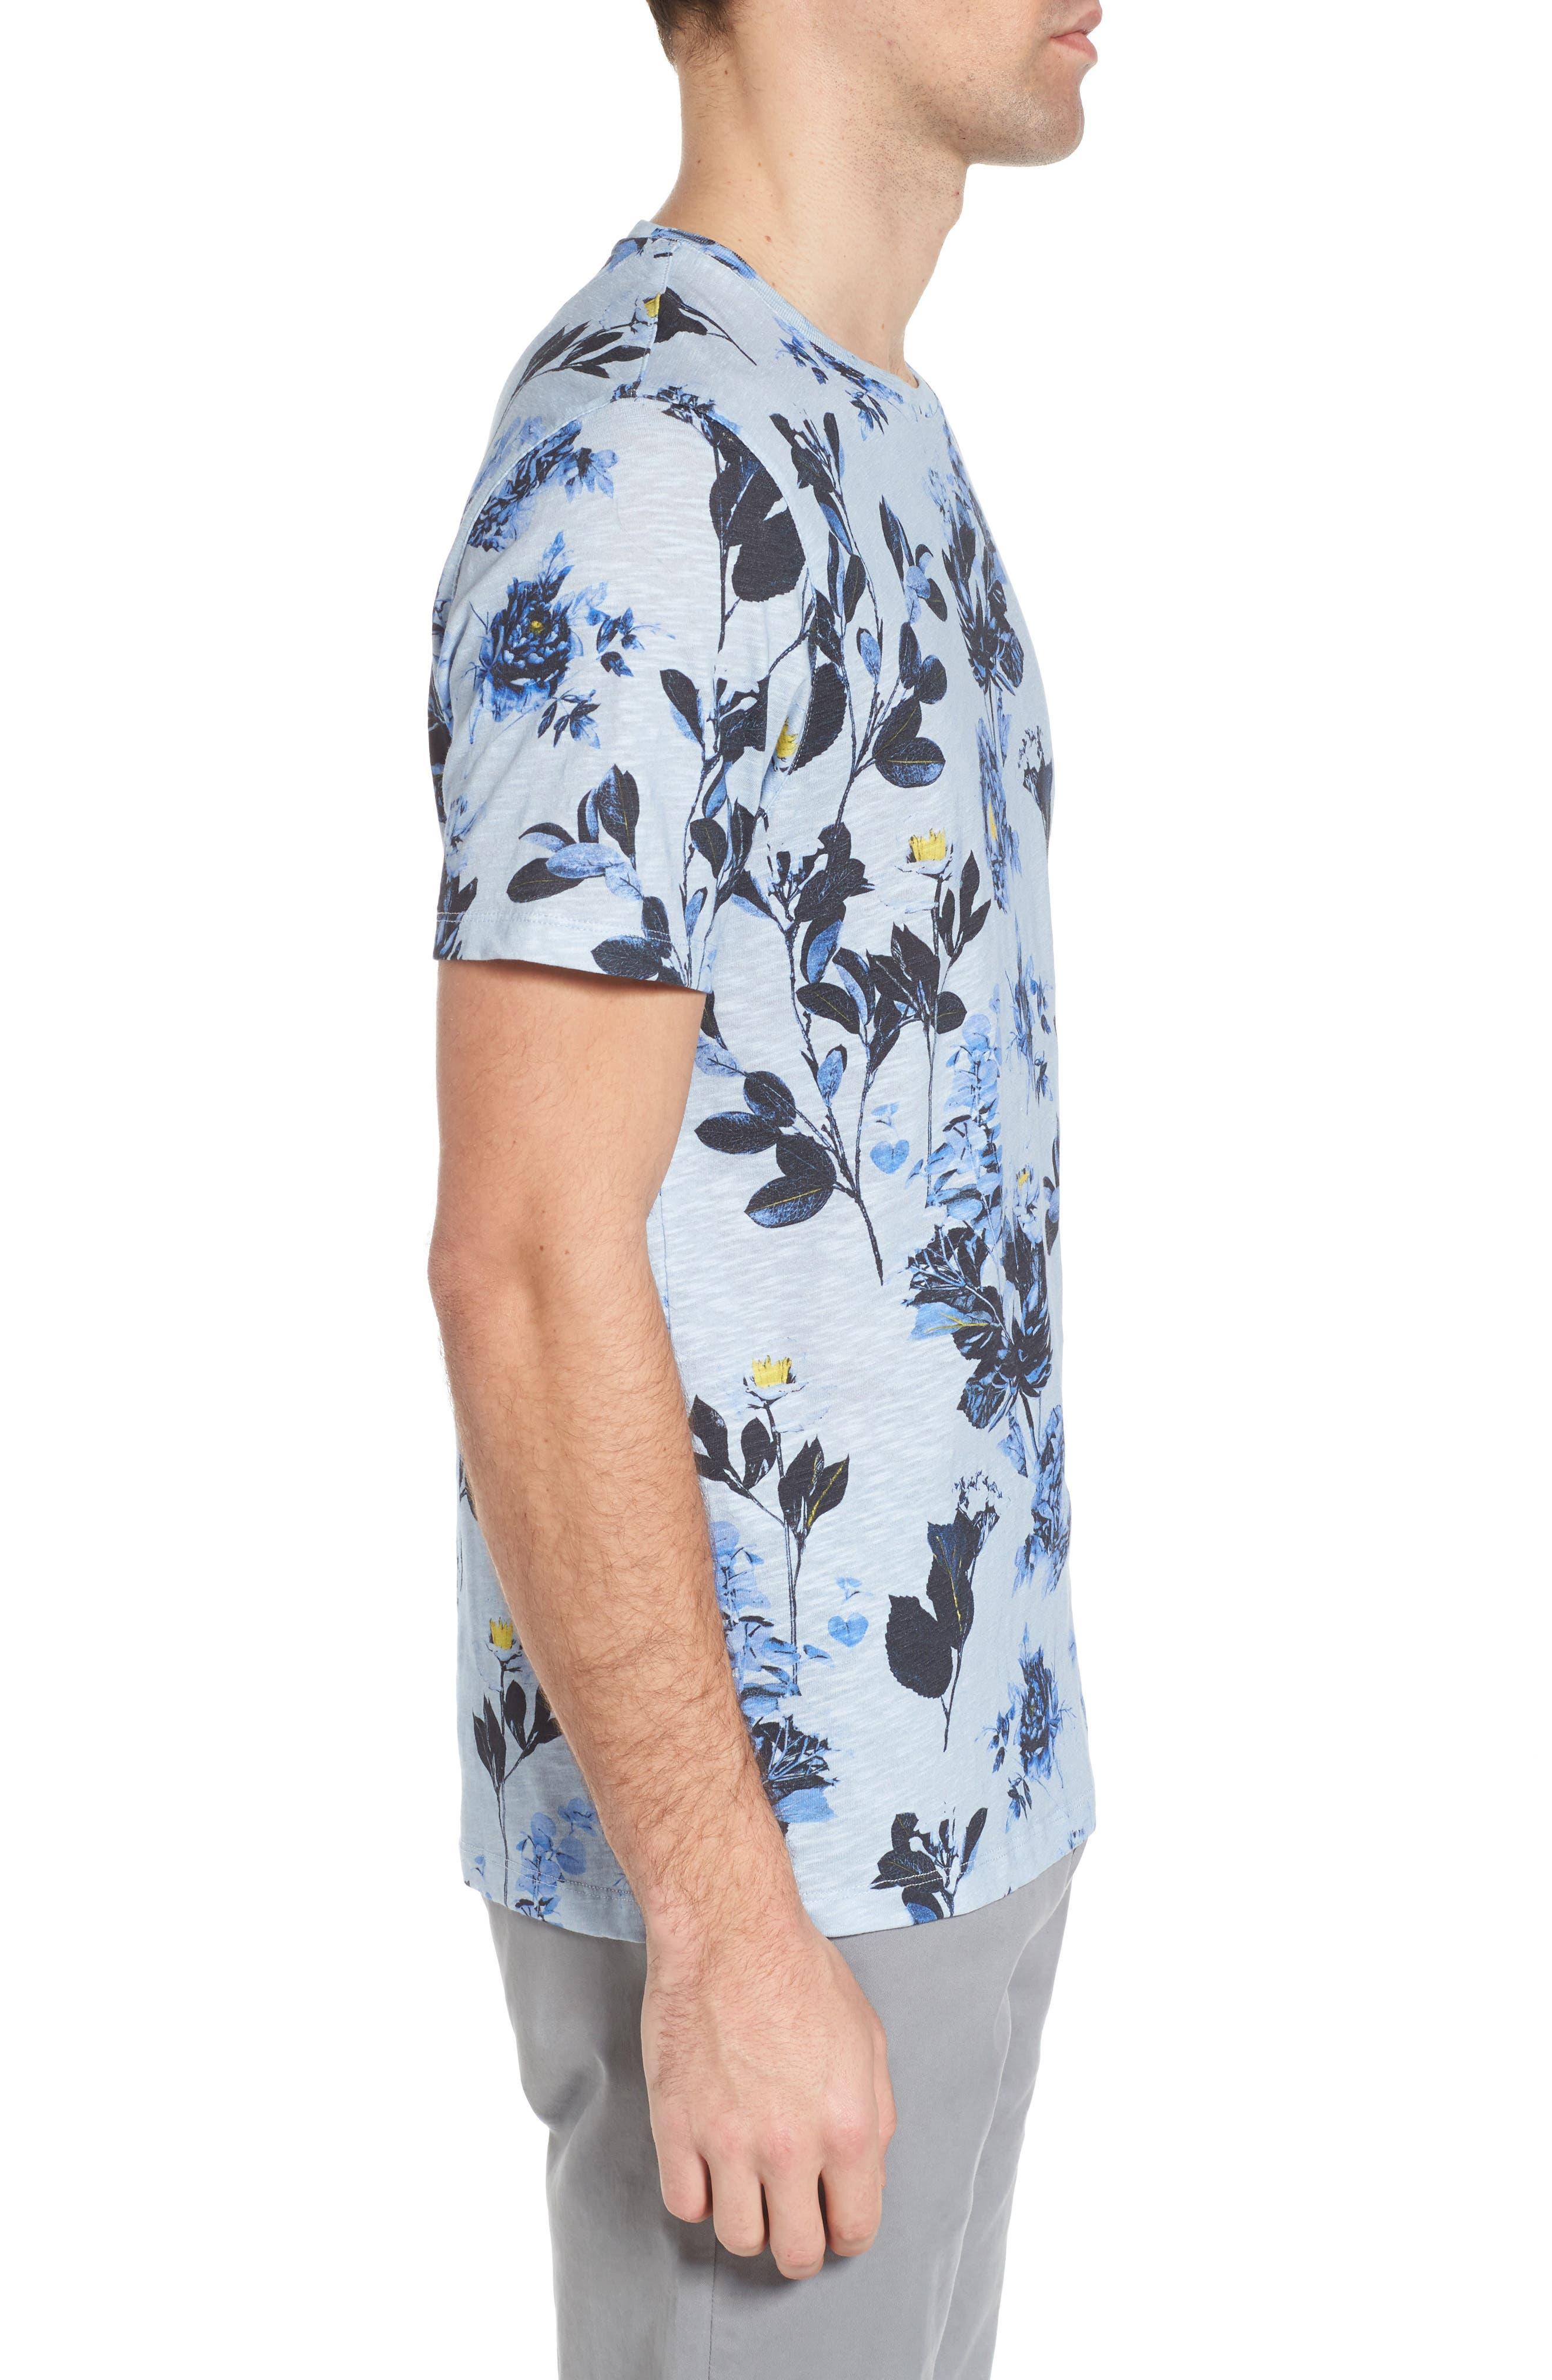 Doberma Trim Fit Floral Print T-Shirt,                             Alternate thumbnail 6, color,